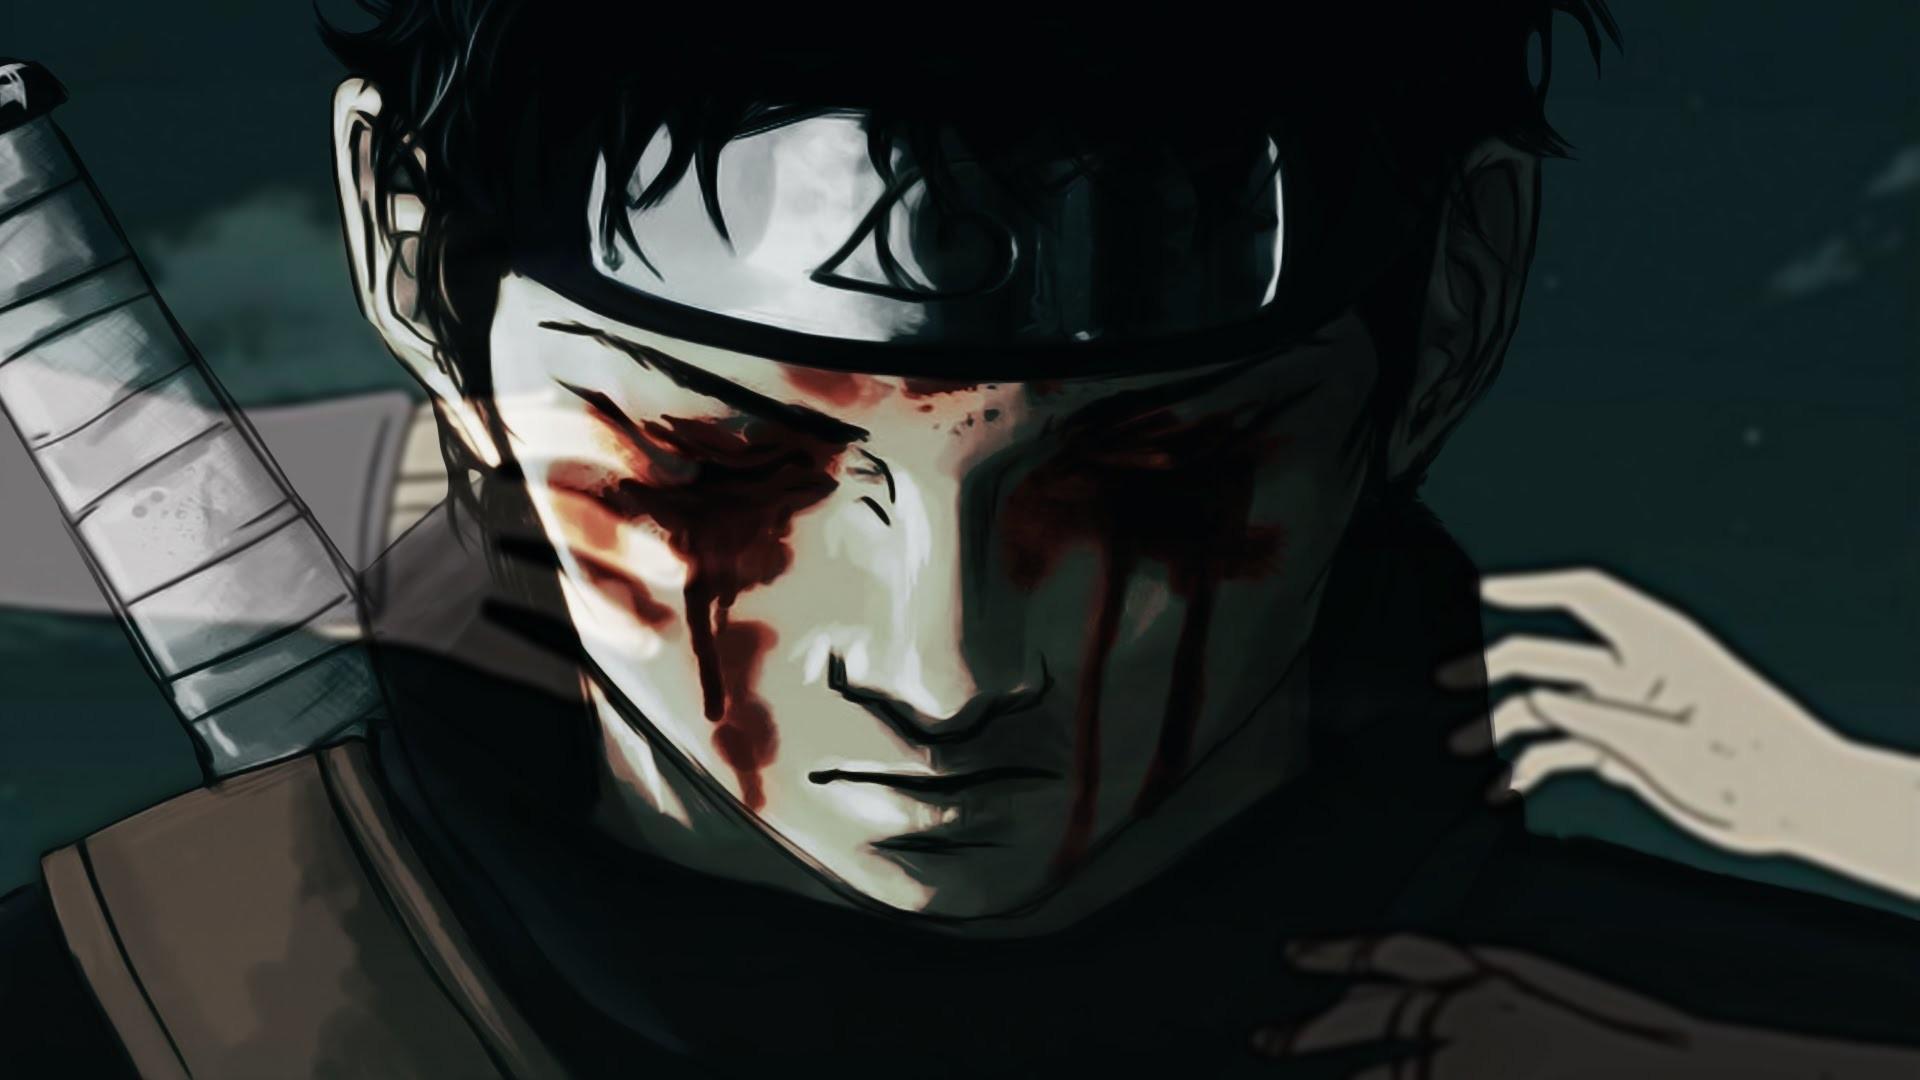 【Animes RAP】- Shisui Uchiha/Part 2 -【Suicida】